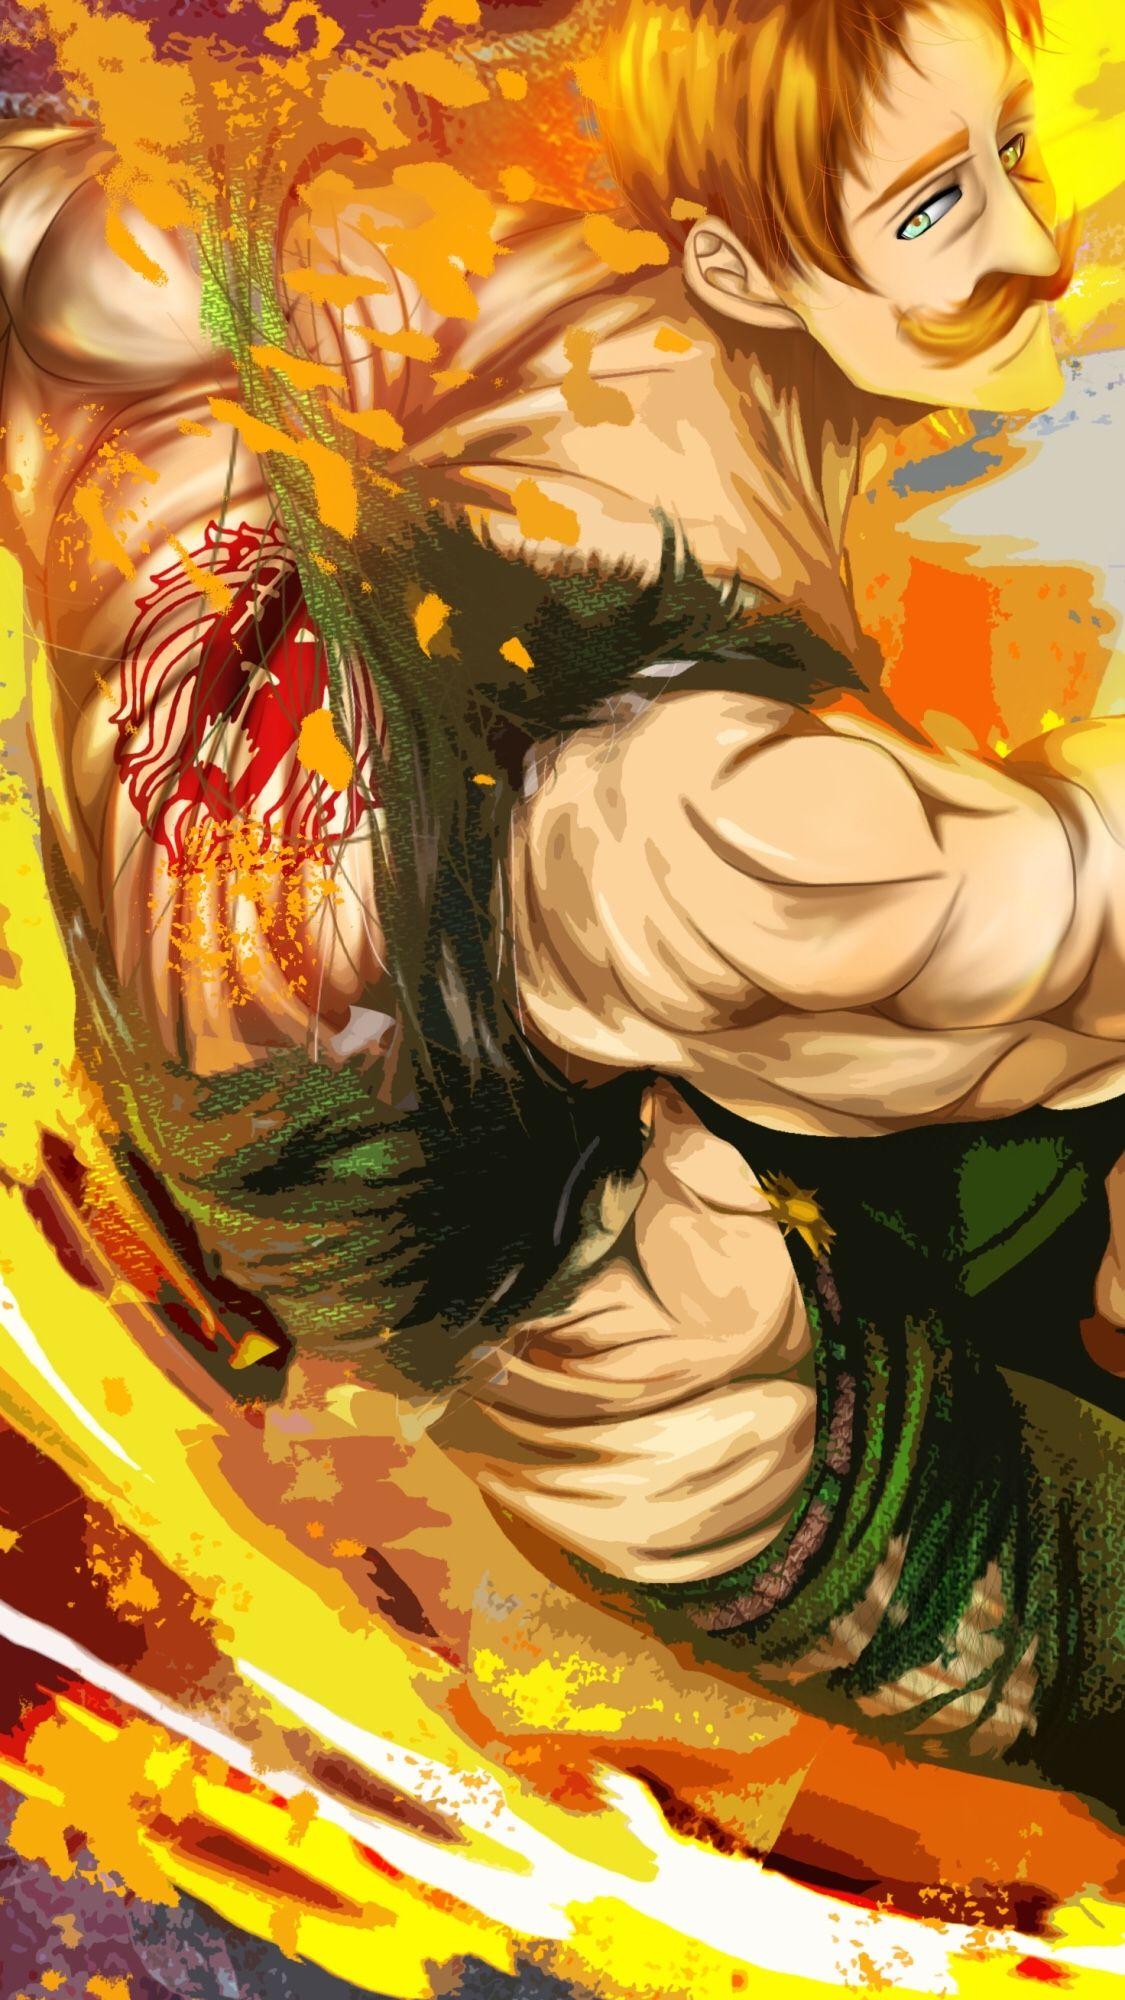 Nanatsu no Taizai Chapter 277 Seven deadly sins anime